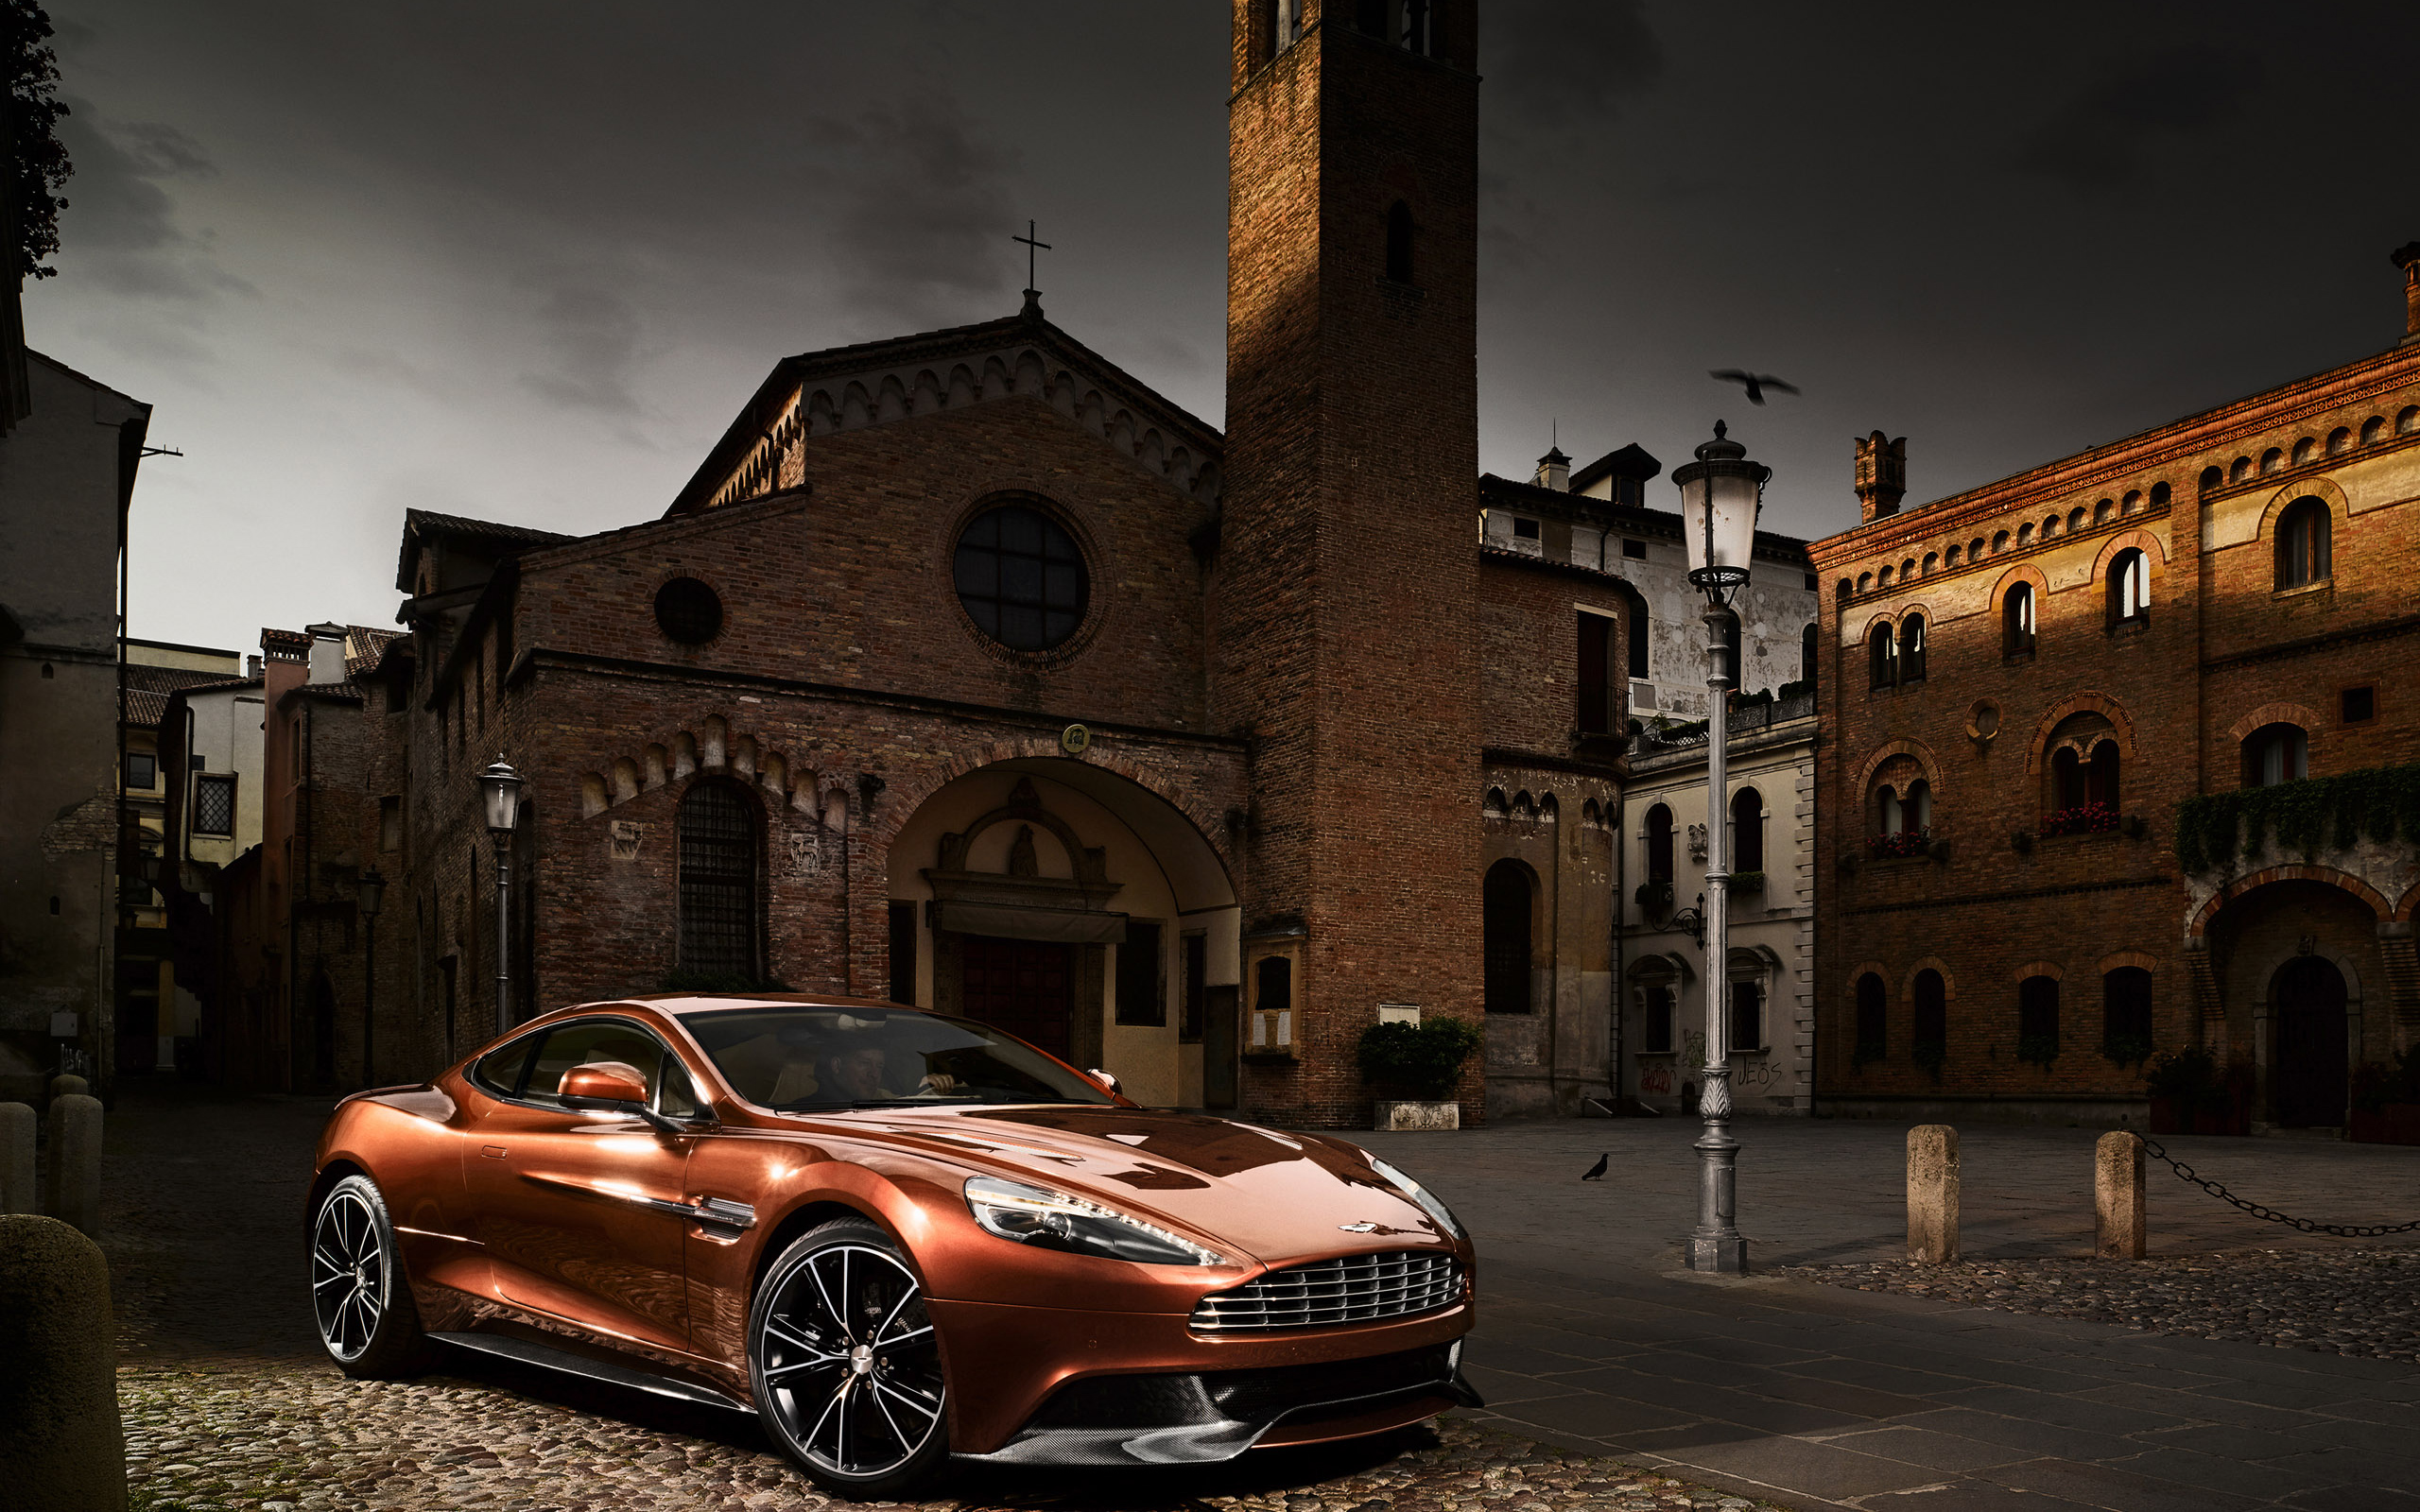 2013 Aston Martin Vanquish Wallpaper Hd Car Wallpapers